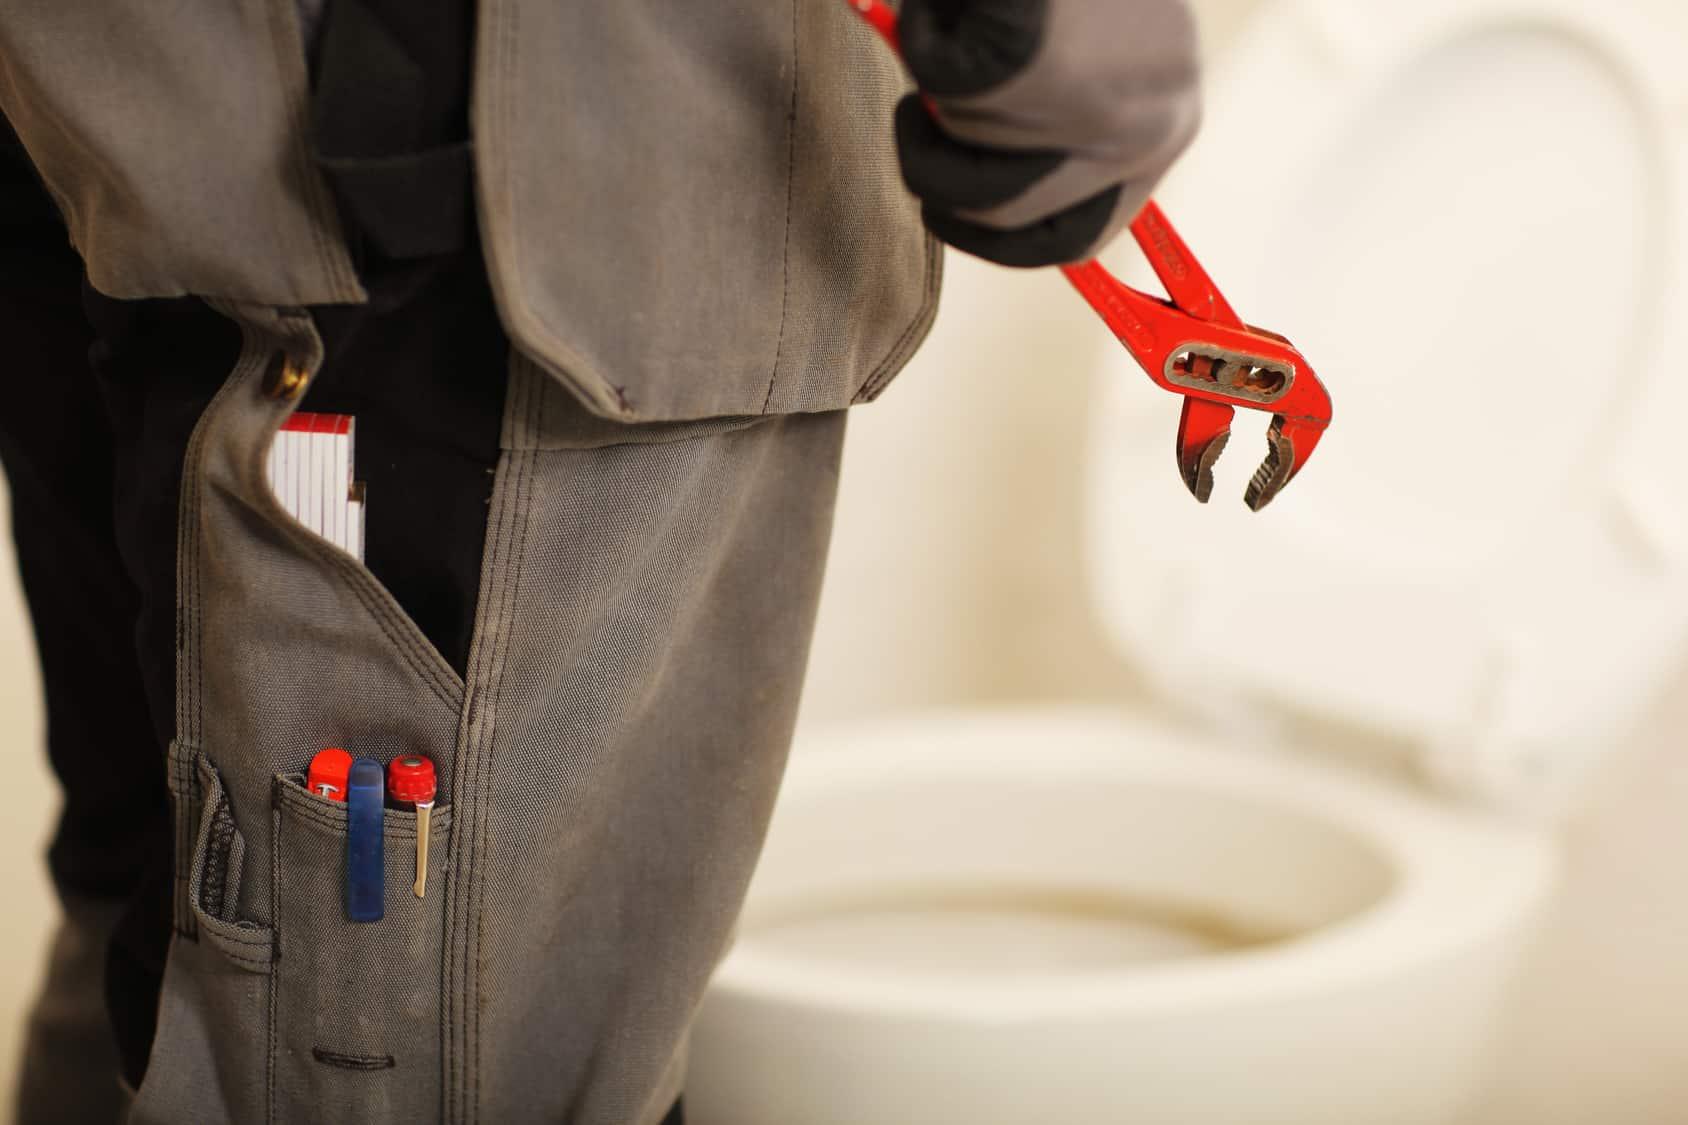 comment enlever abattant wc